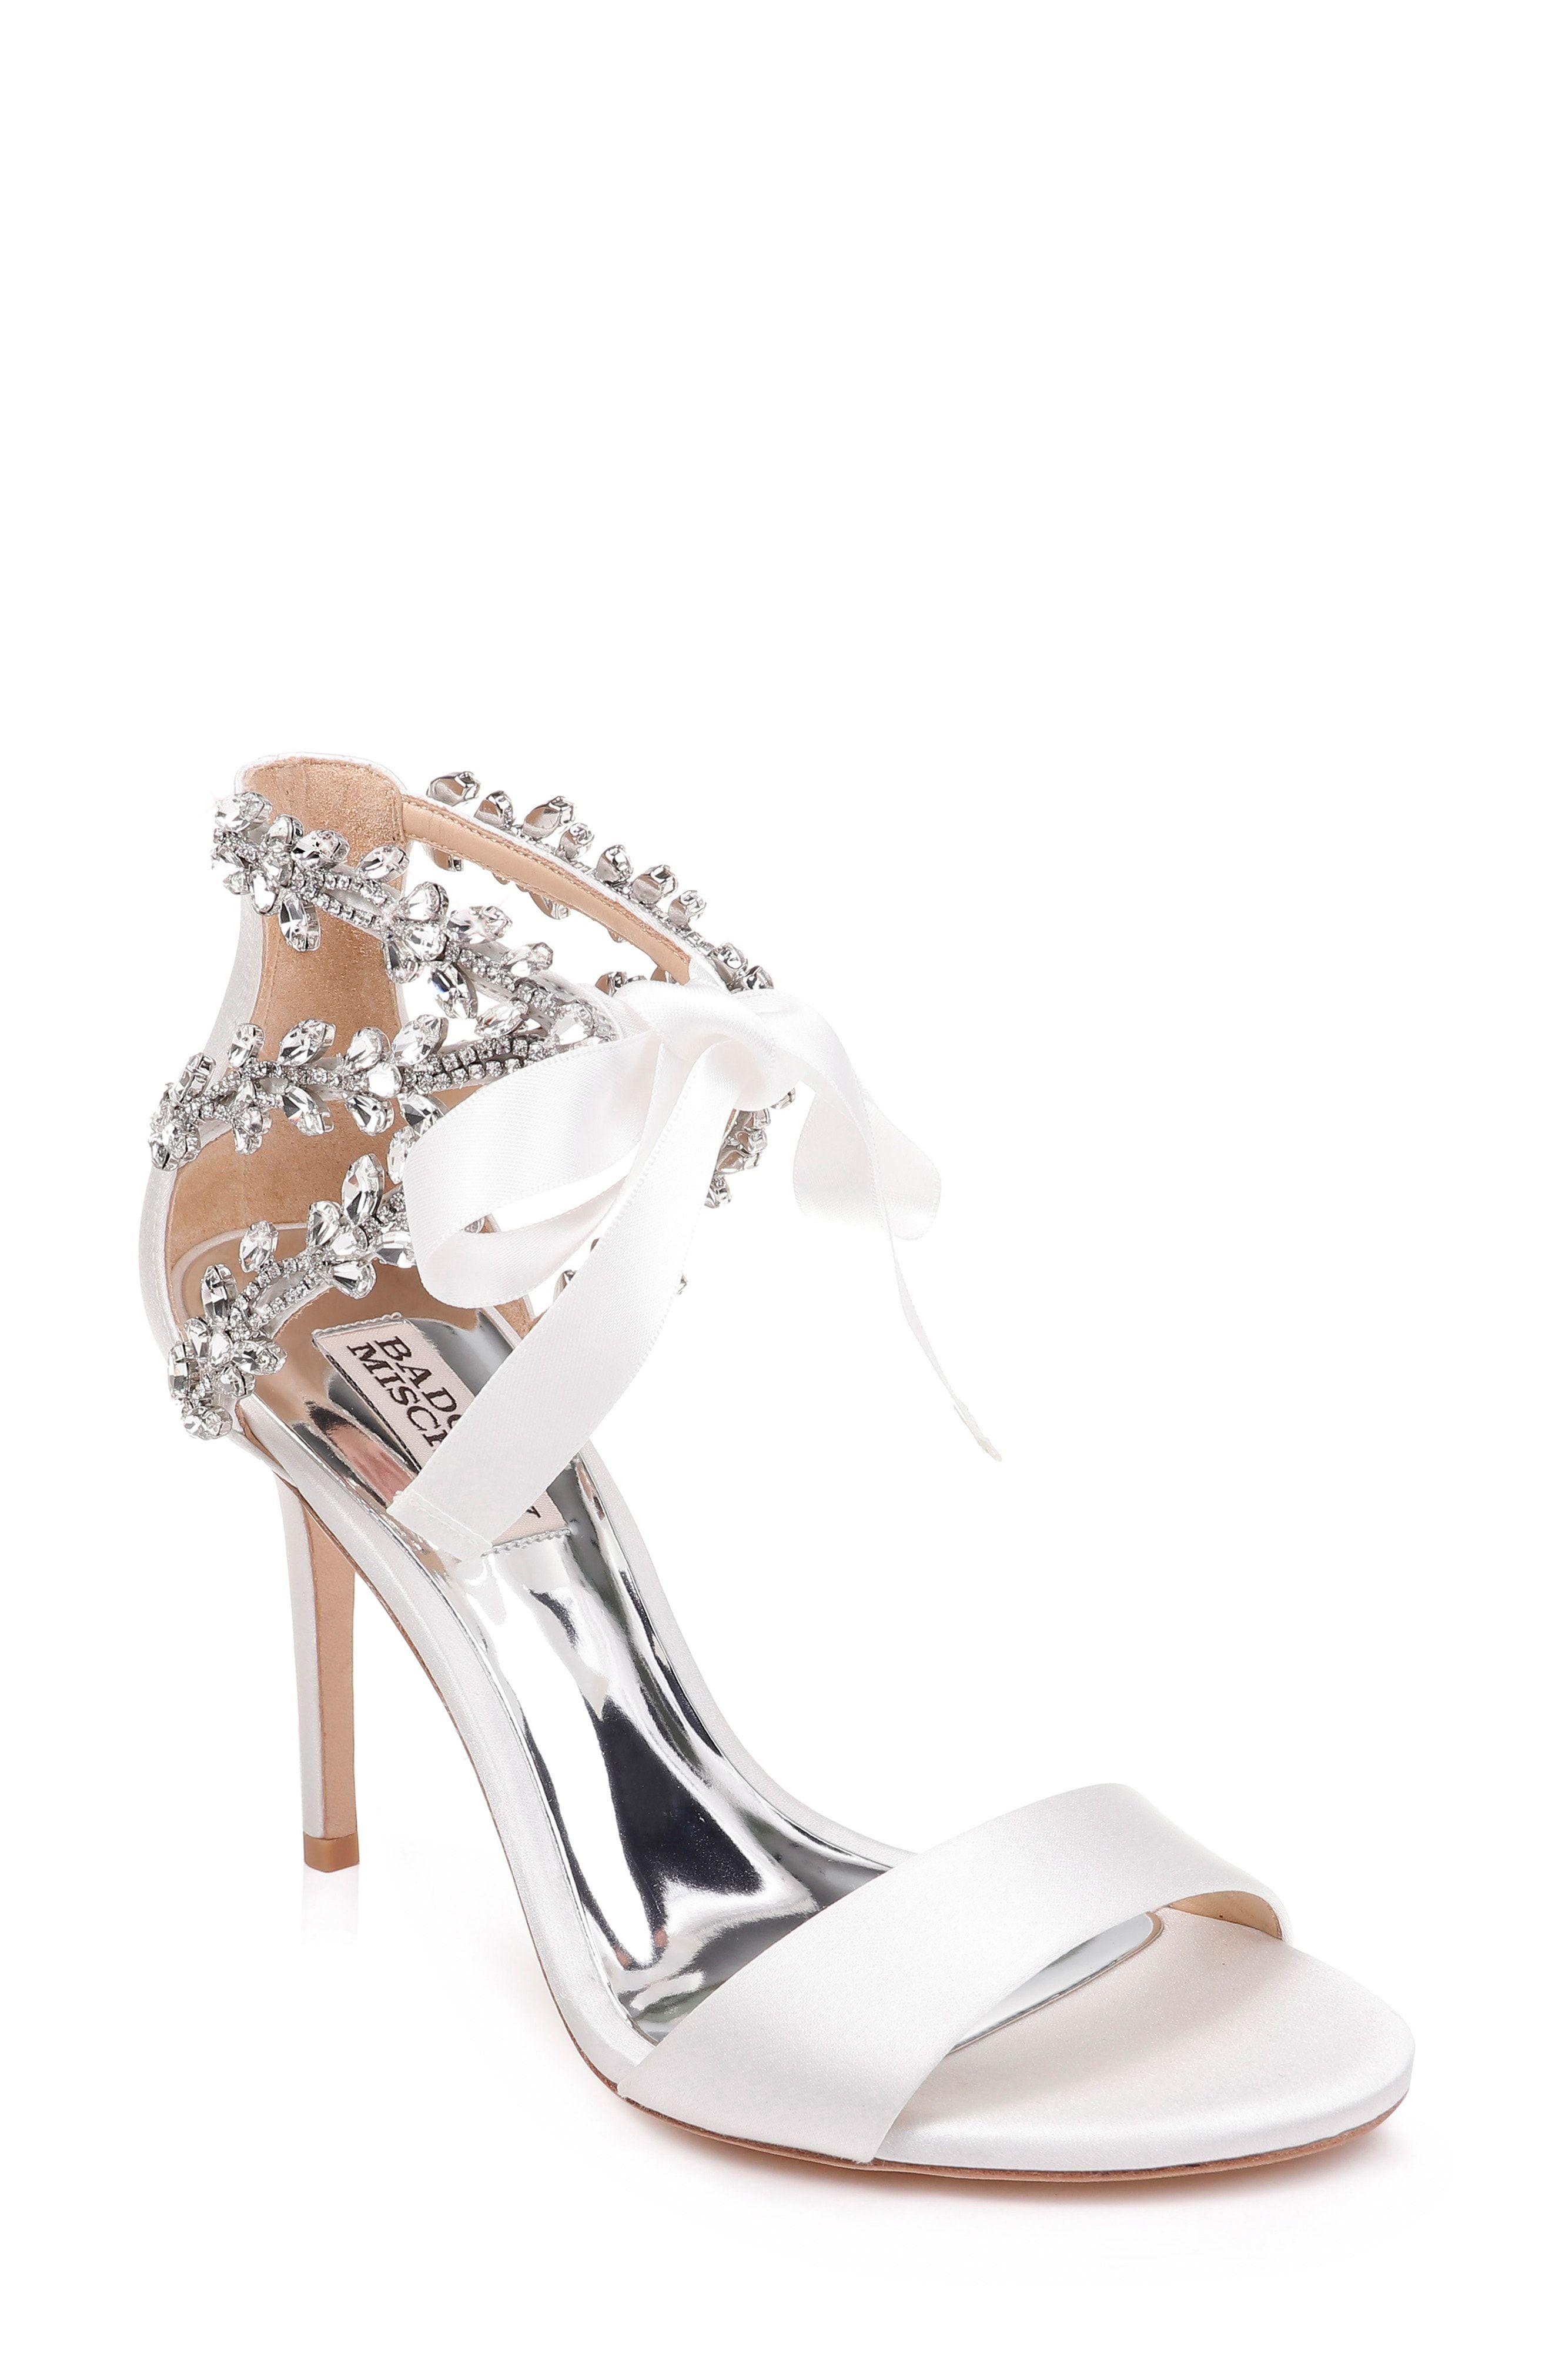 2822aa72ee6 Dream wedding heels! Embellished bridal high heeled sandals with a ...